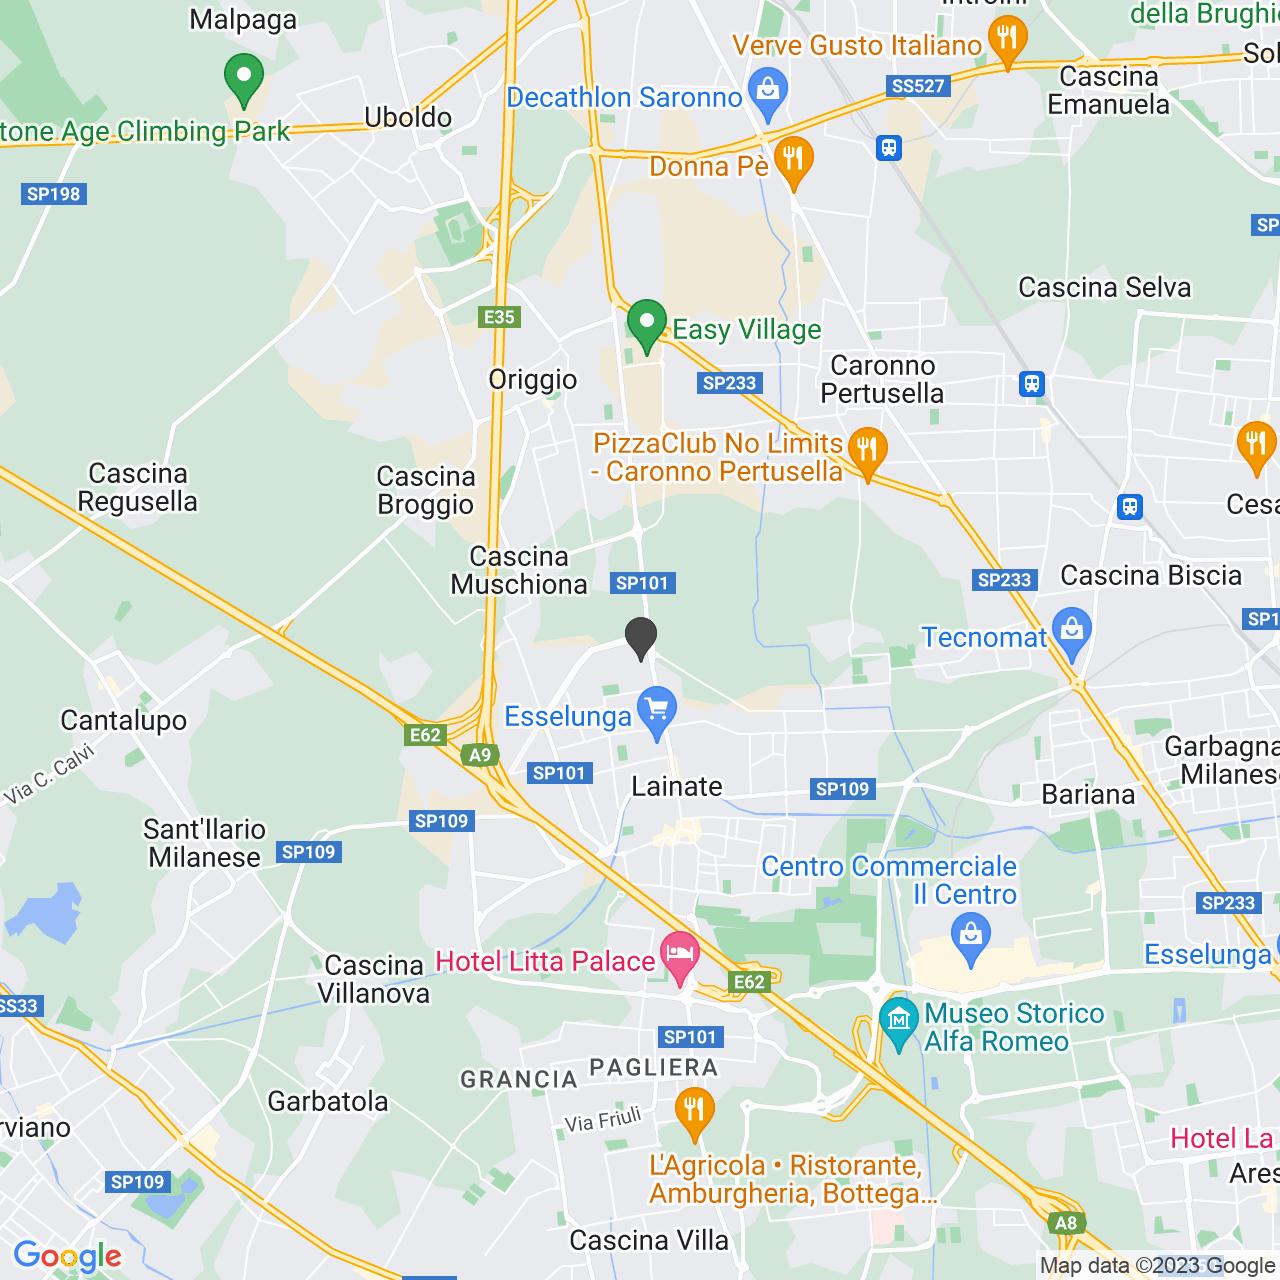 MISSIONE EVANGELICA PER L'ITALIA